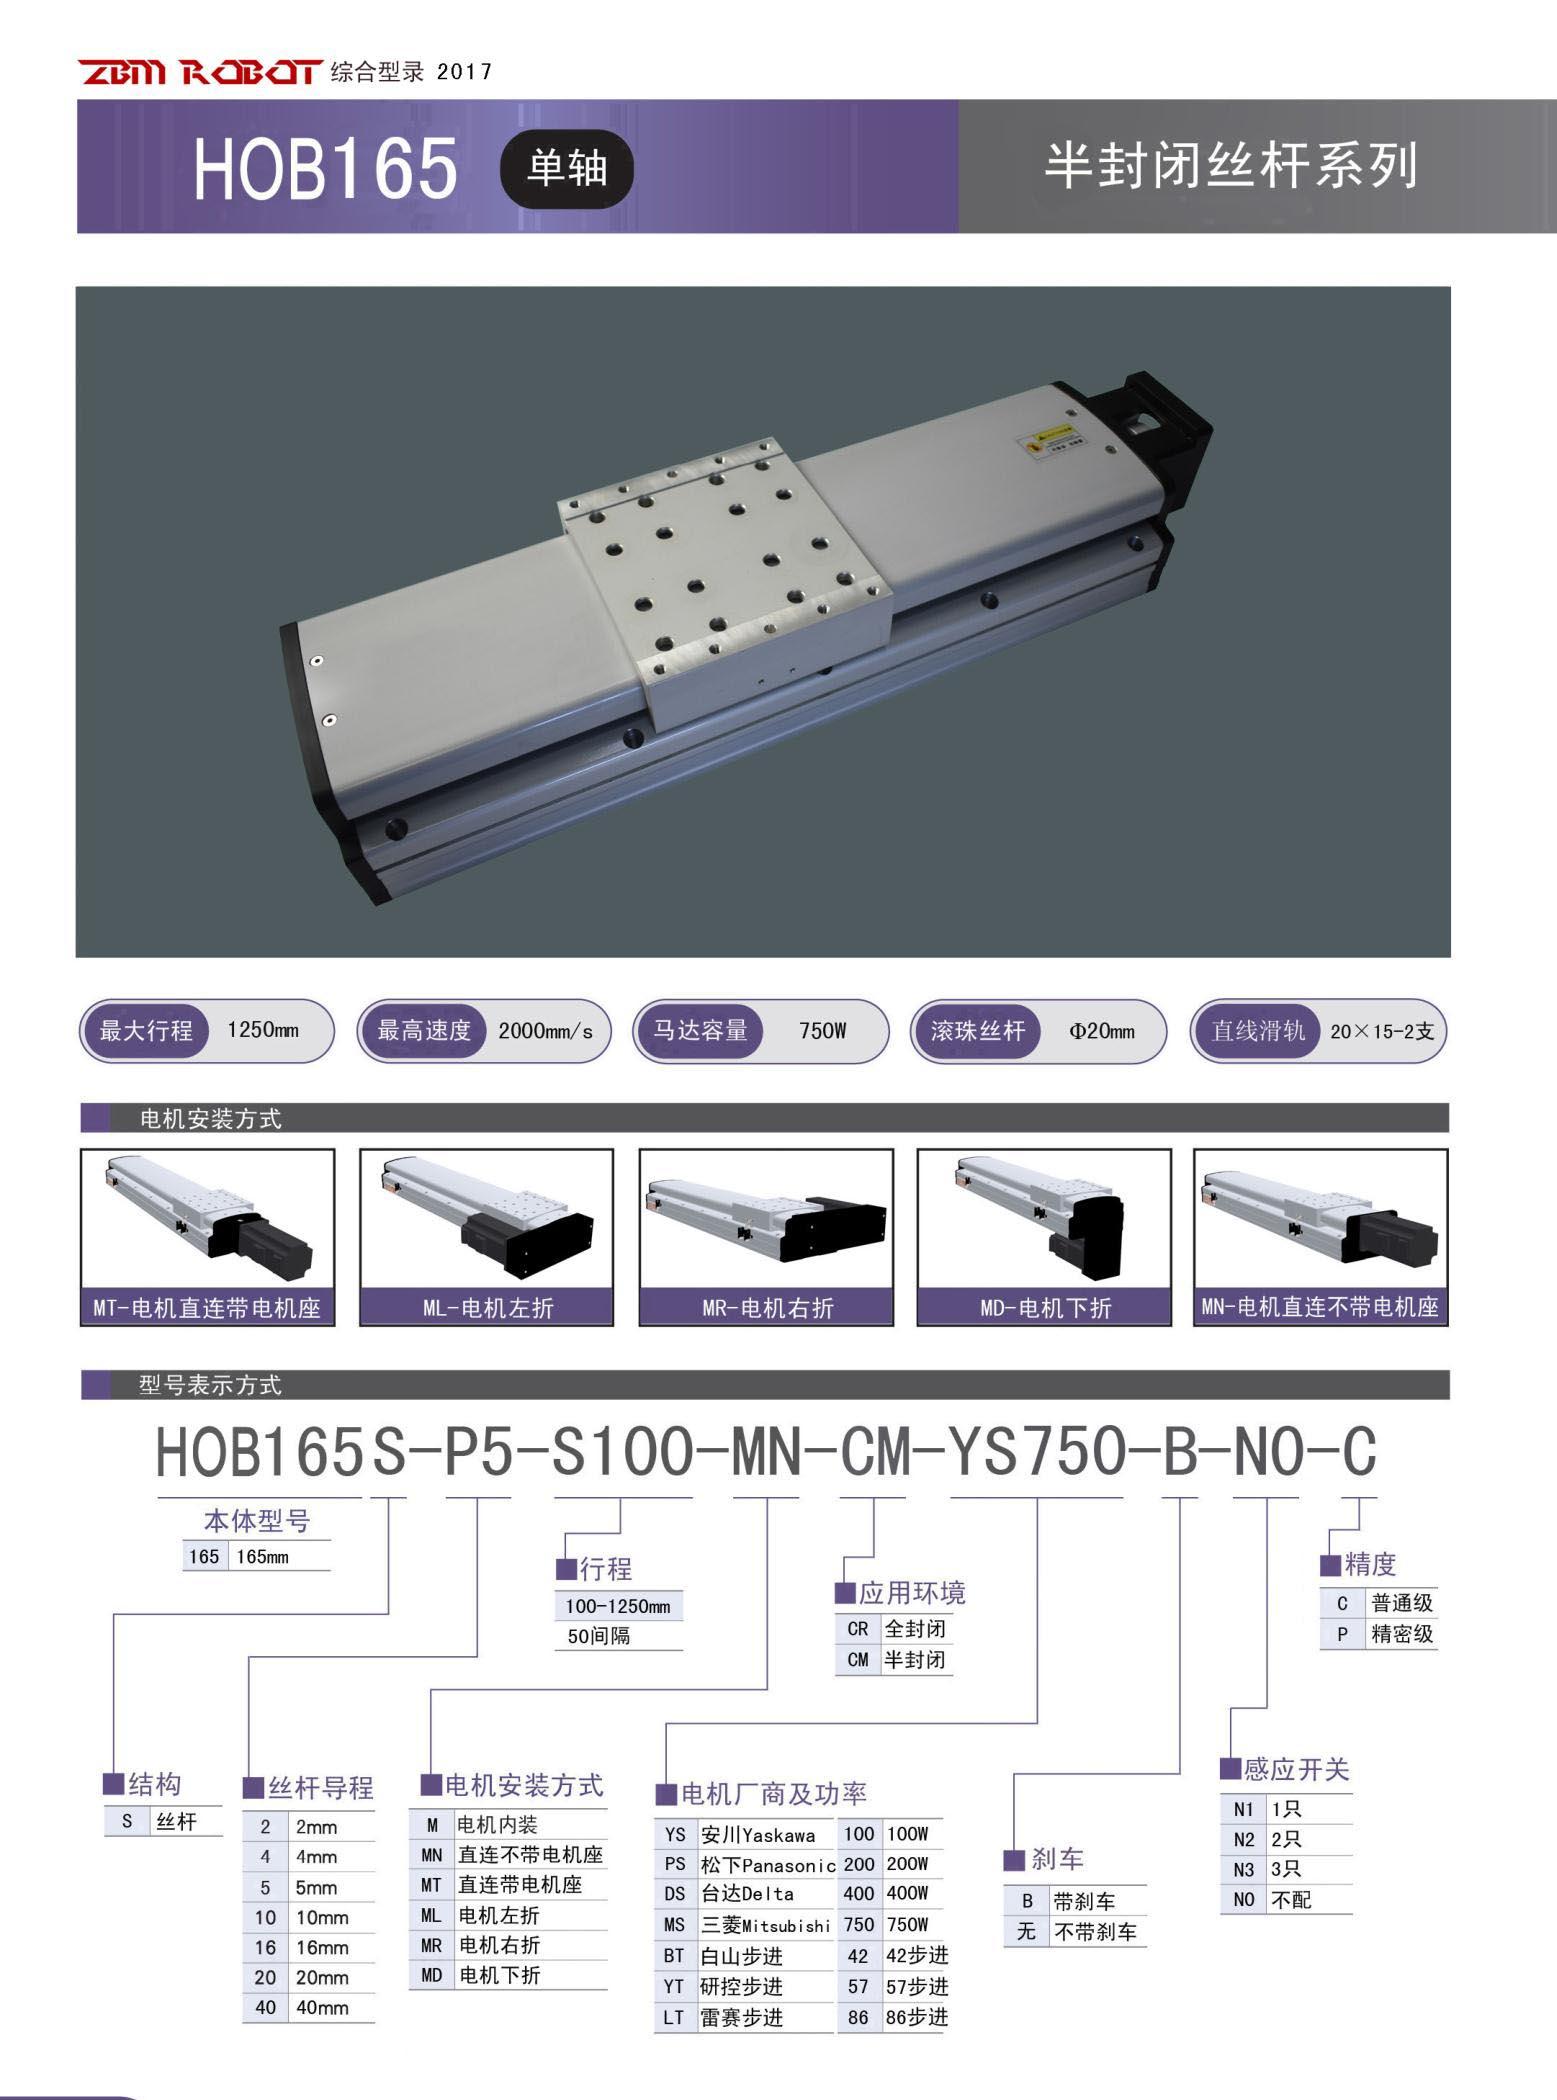 HOB165S-CM|半封闭丝杆模组-深圳市鸿博智能装备有限公司